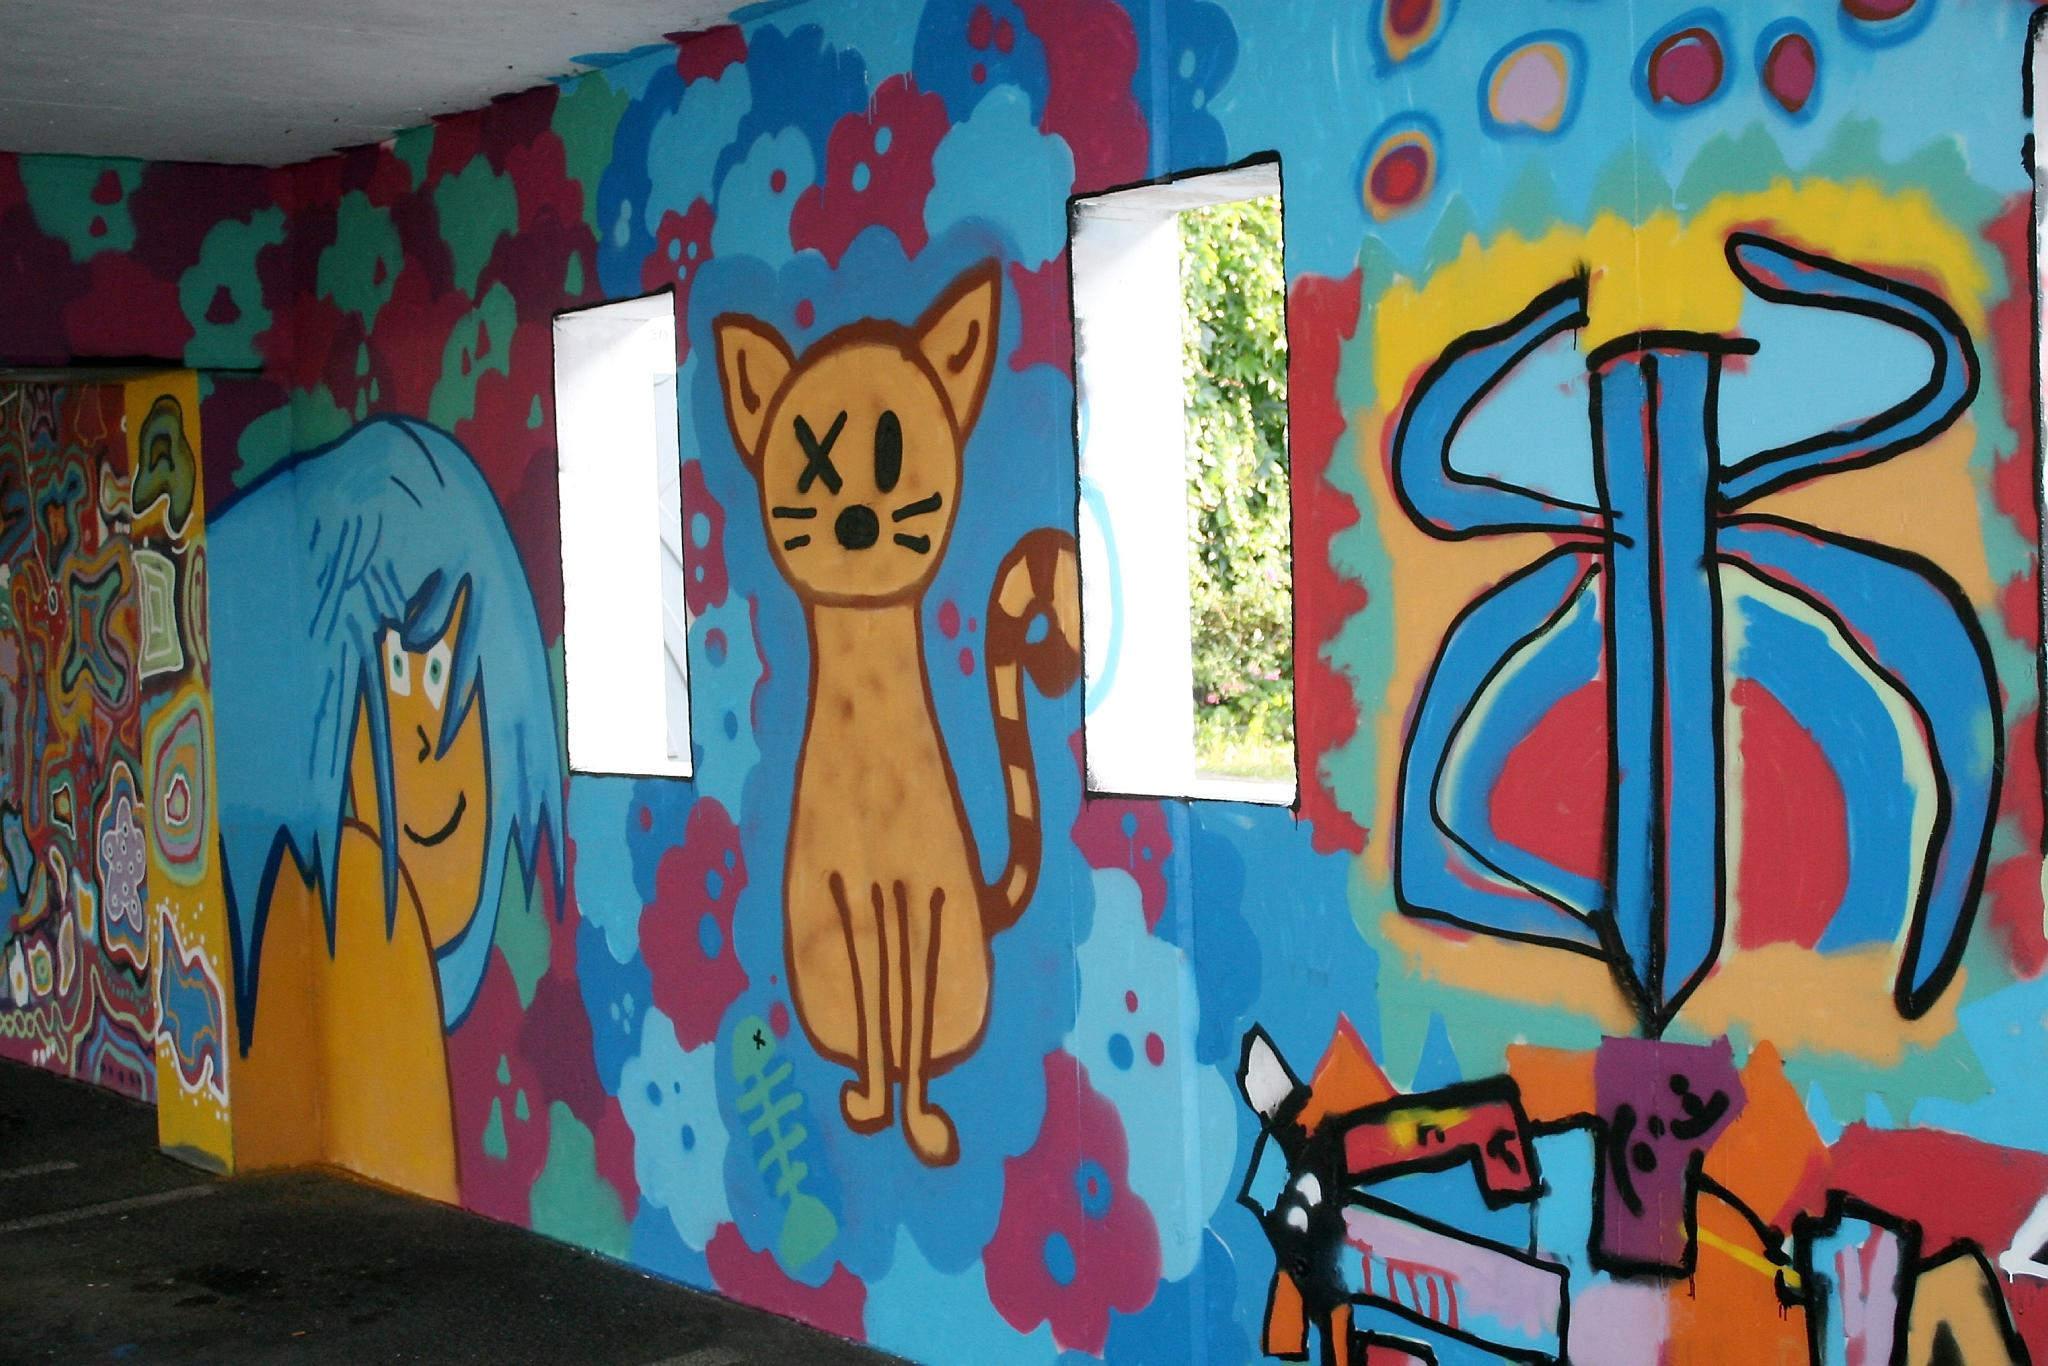 Coole Graffiti Parkhaus In Wolfhagen Neu Gestaltet Wolfhagen